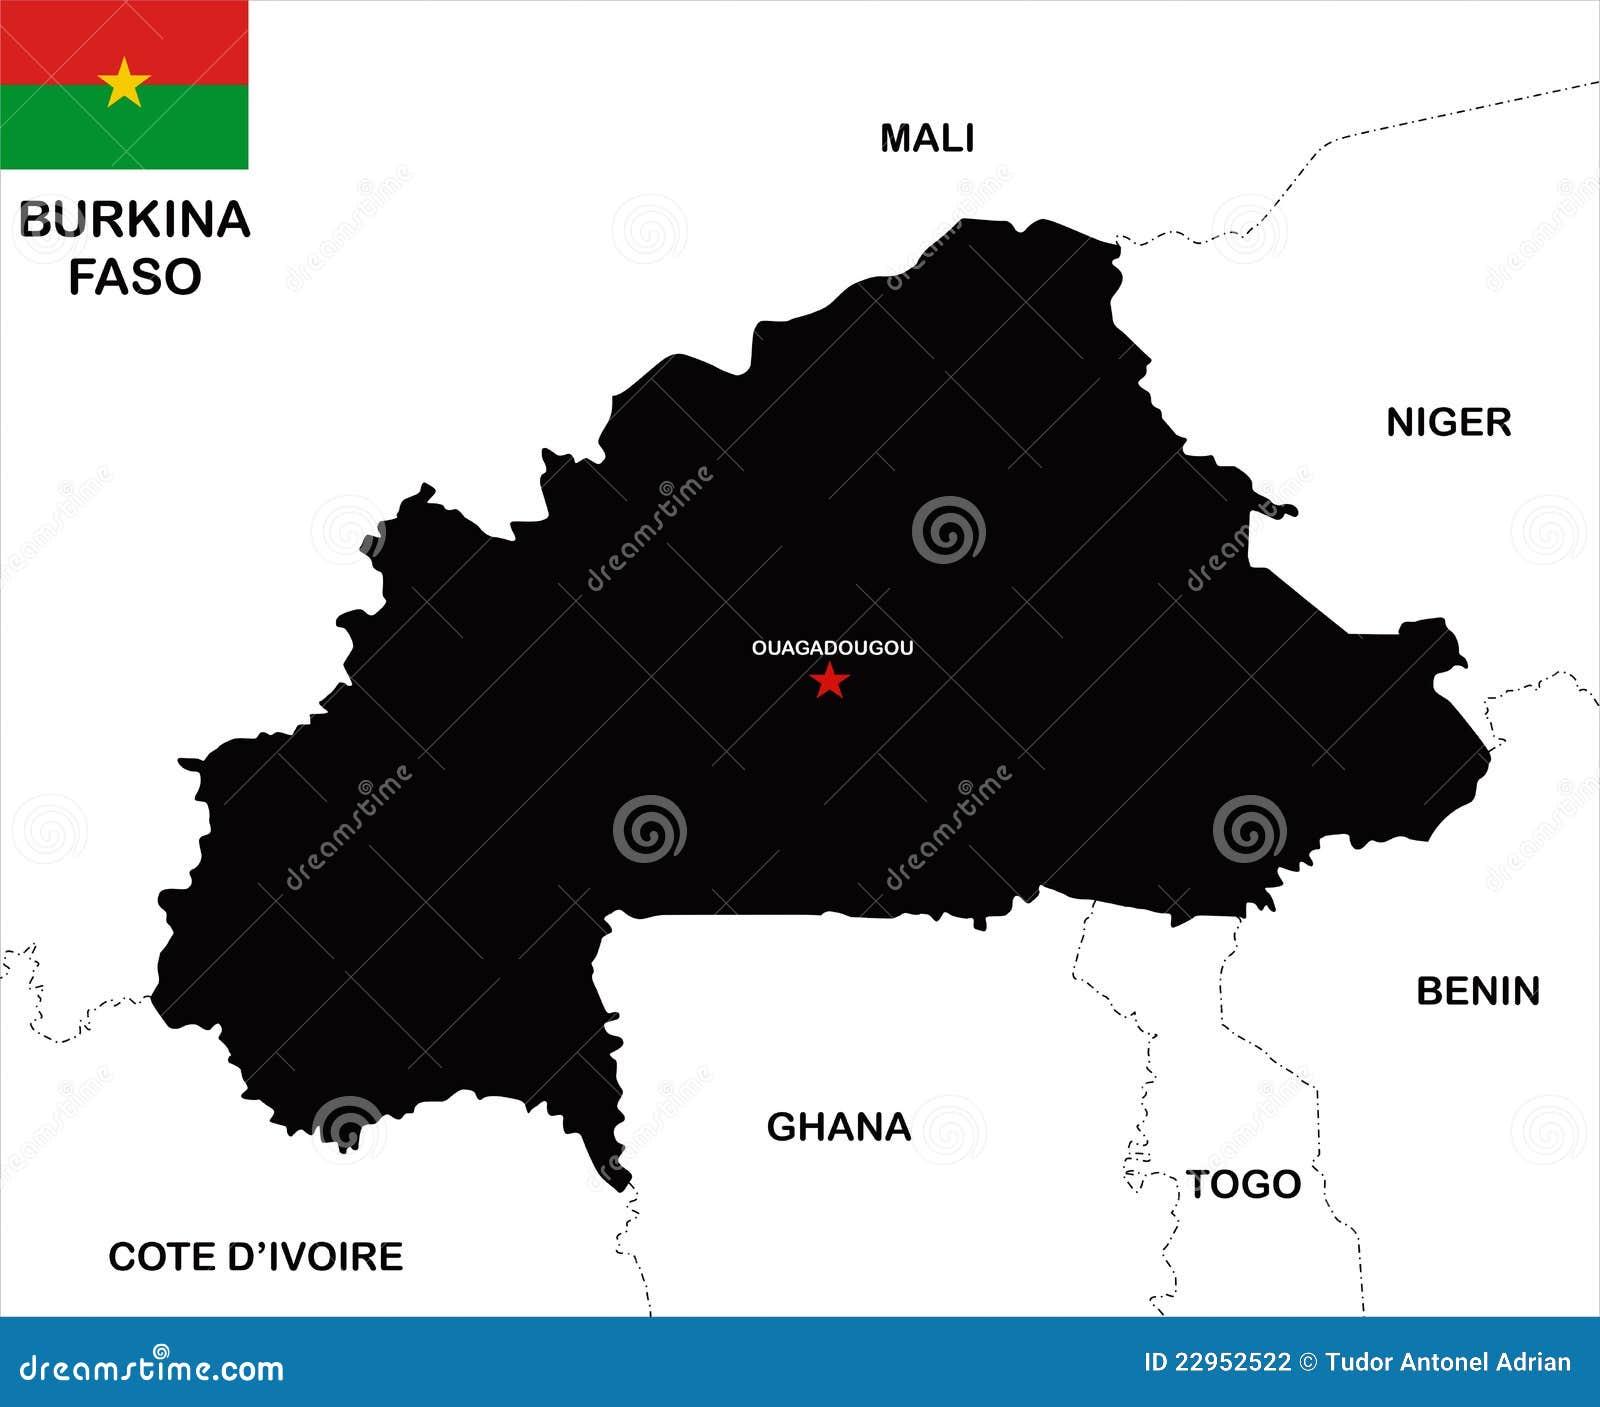 Burkina Faso Political Map Cartoon Vector CartoonDealercom 96139187